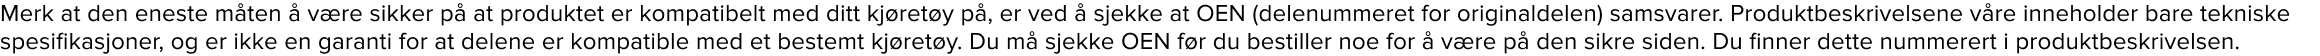 PHILIPS X825 283 480 000, 1-40-772-015, 001 488 00, 11335600, 11335601 Lyspære, fjernlys